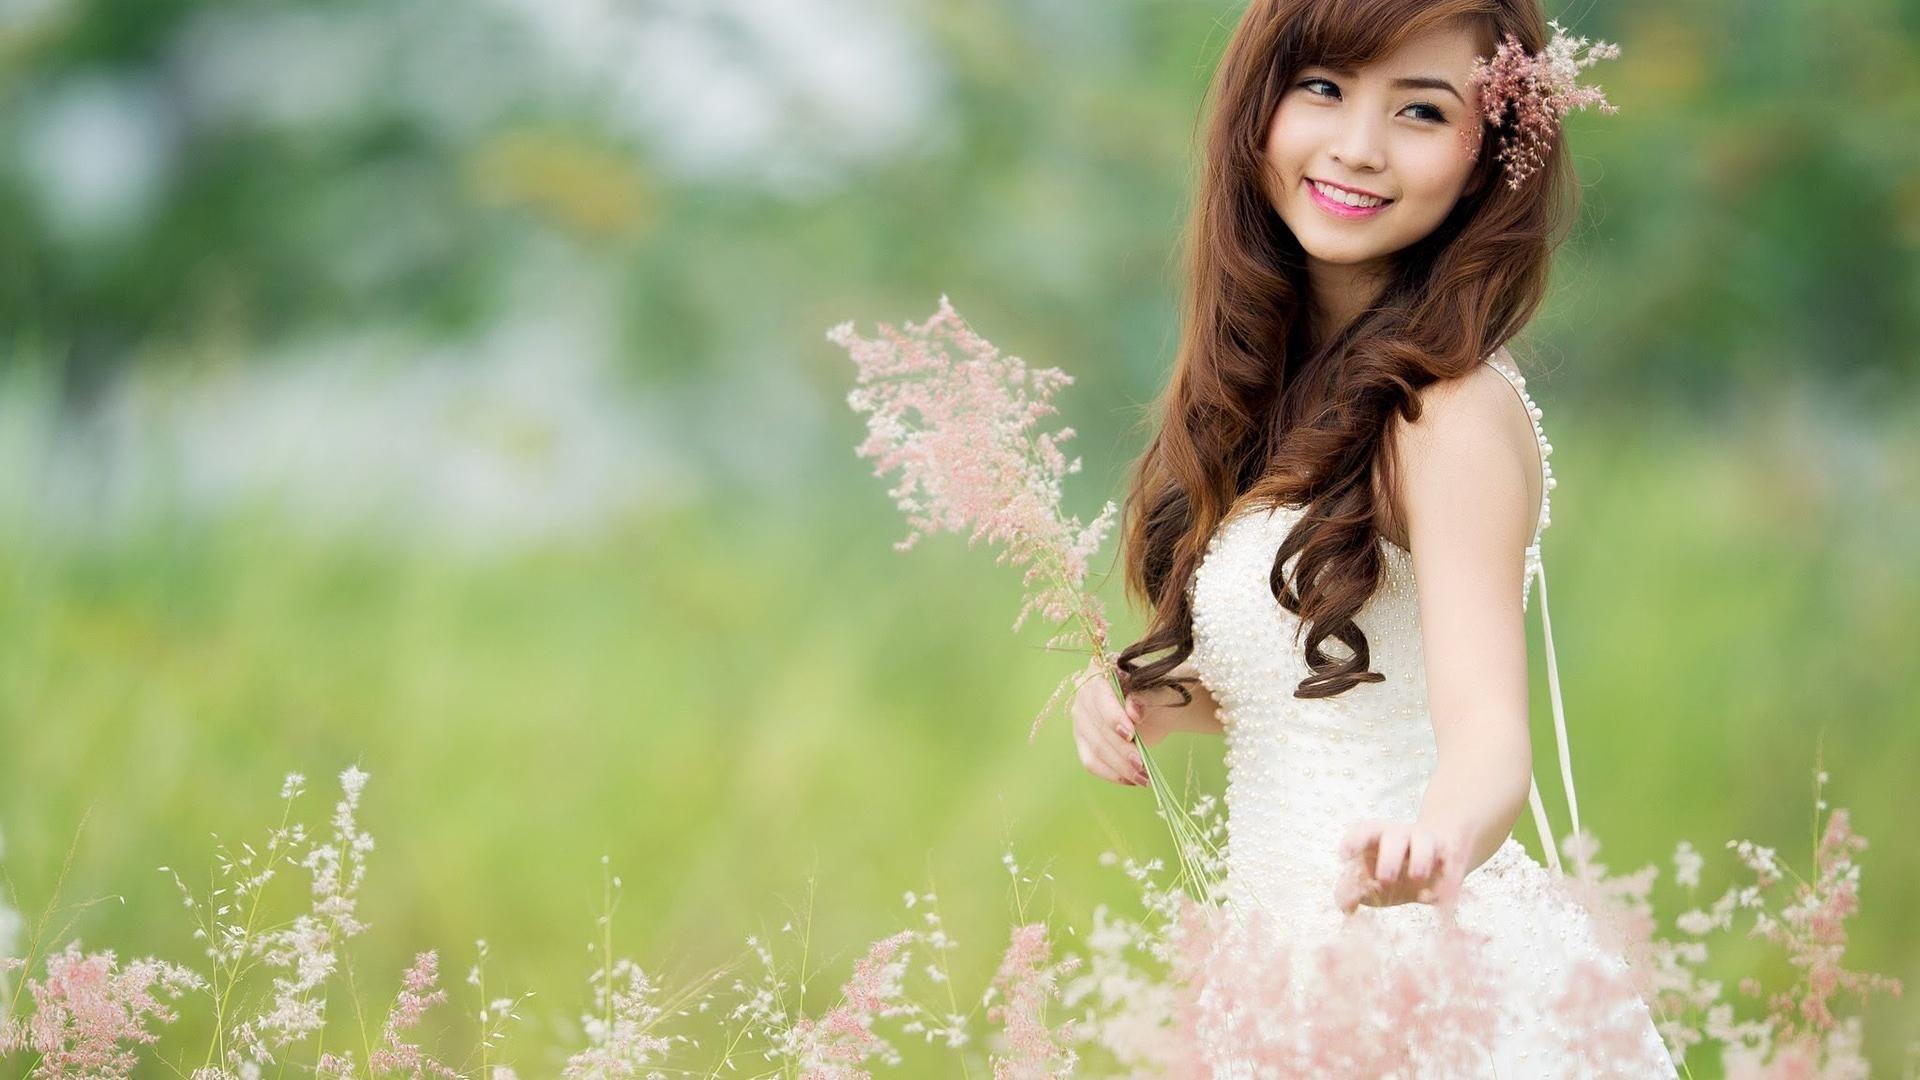 cute girl wallpapers ·①